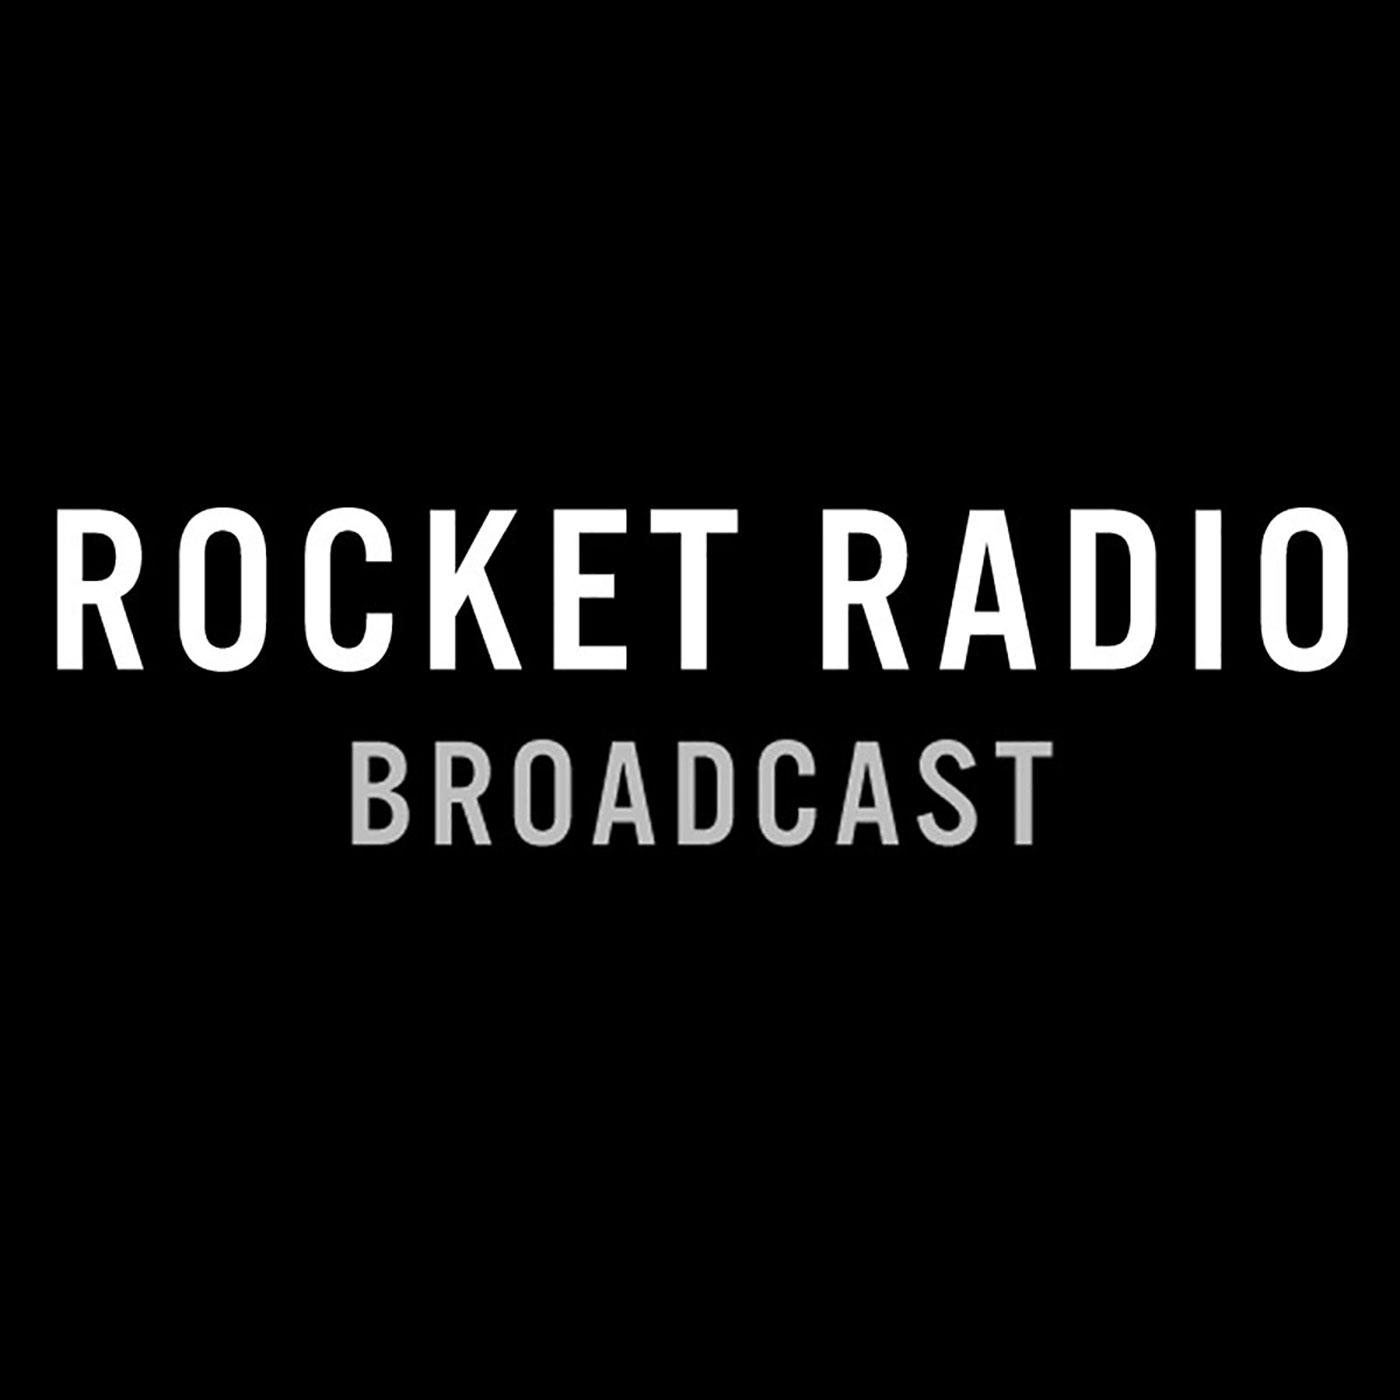 BROADCAST - ROCKET RADIO